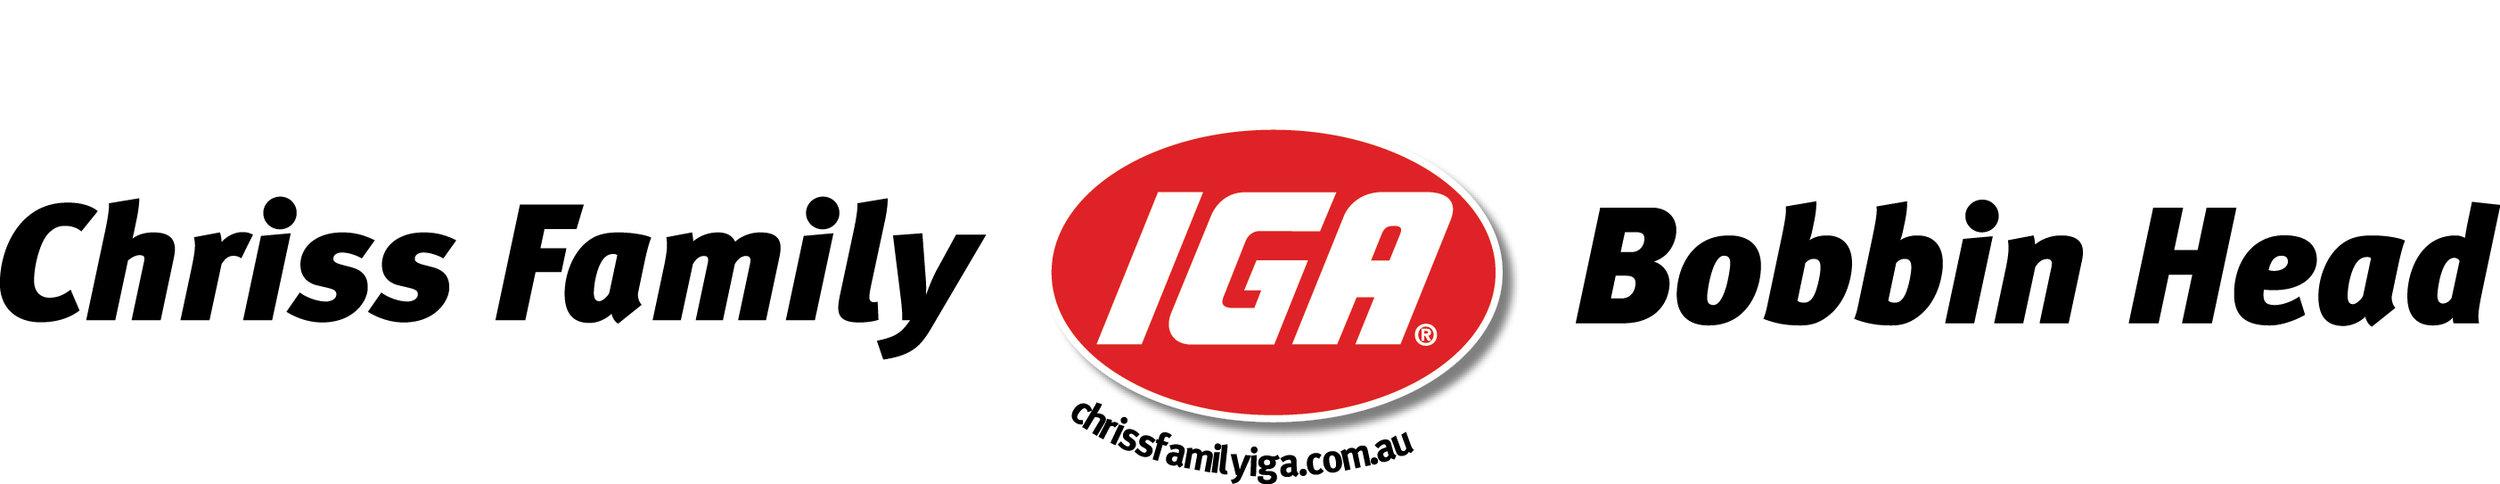 CF_IGA_BobbinHead.jpg